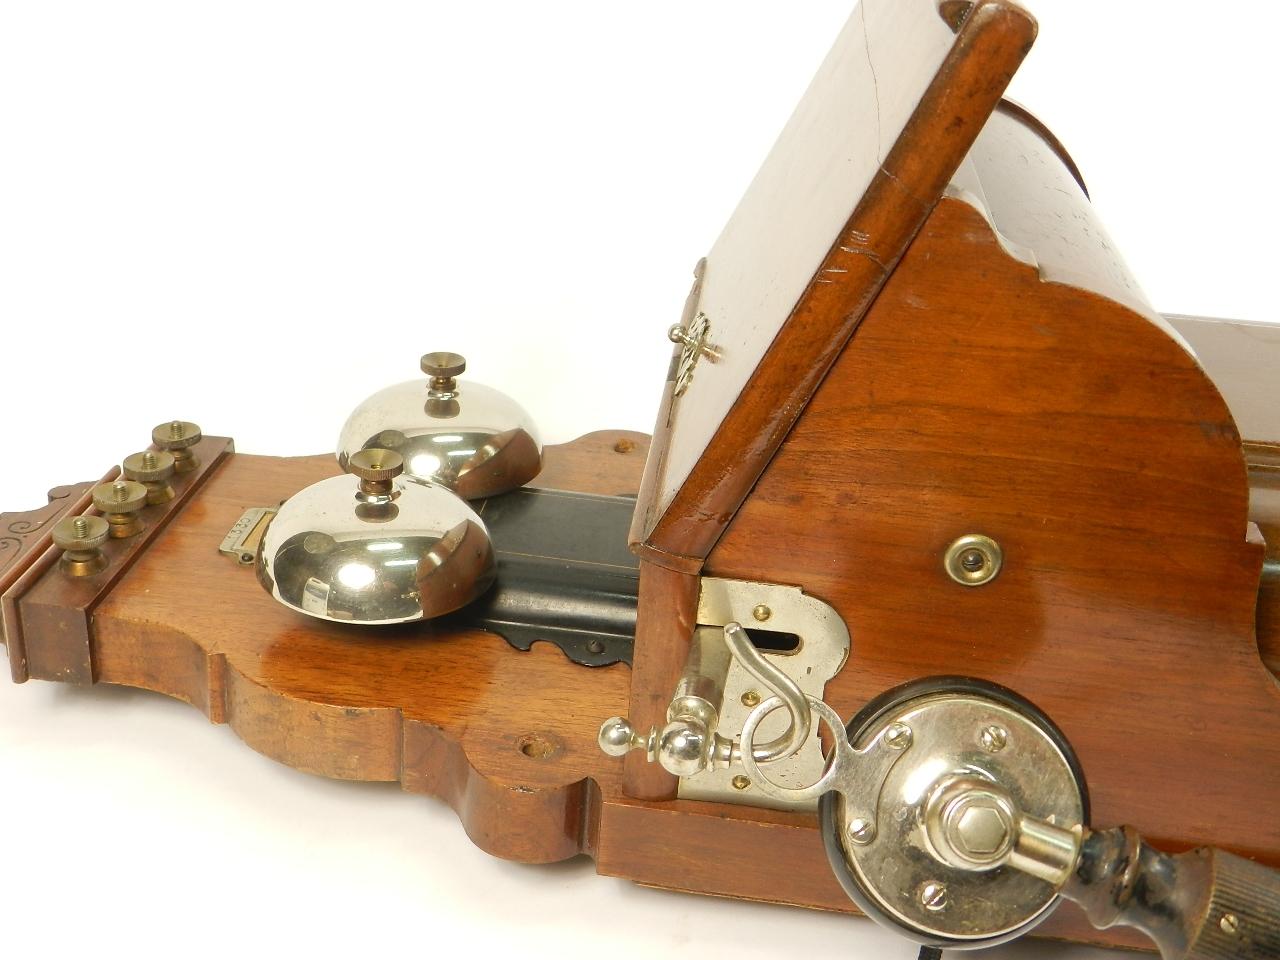 Imagen TELEFONO LOLLAND-FALSTERS  AÑO 1906 41311